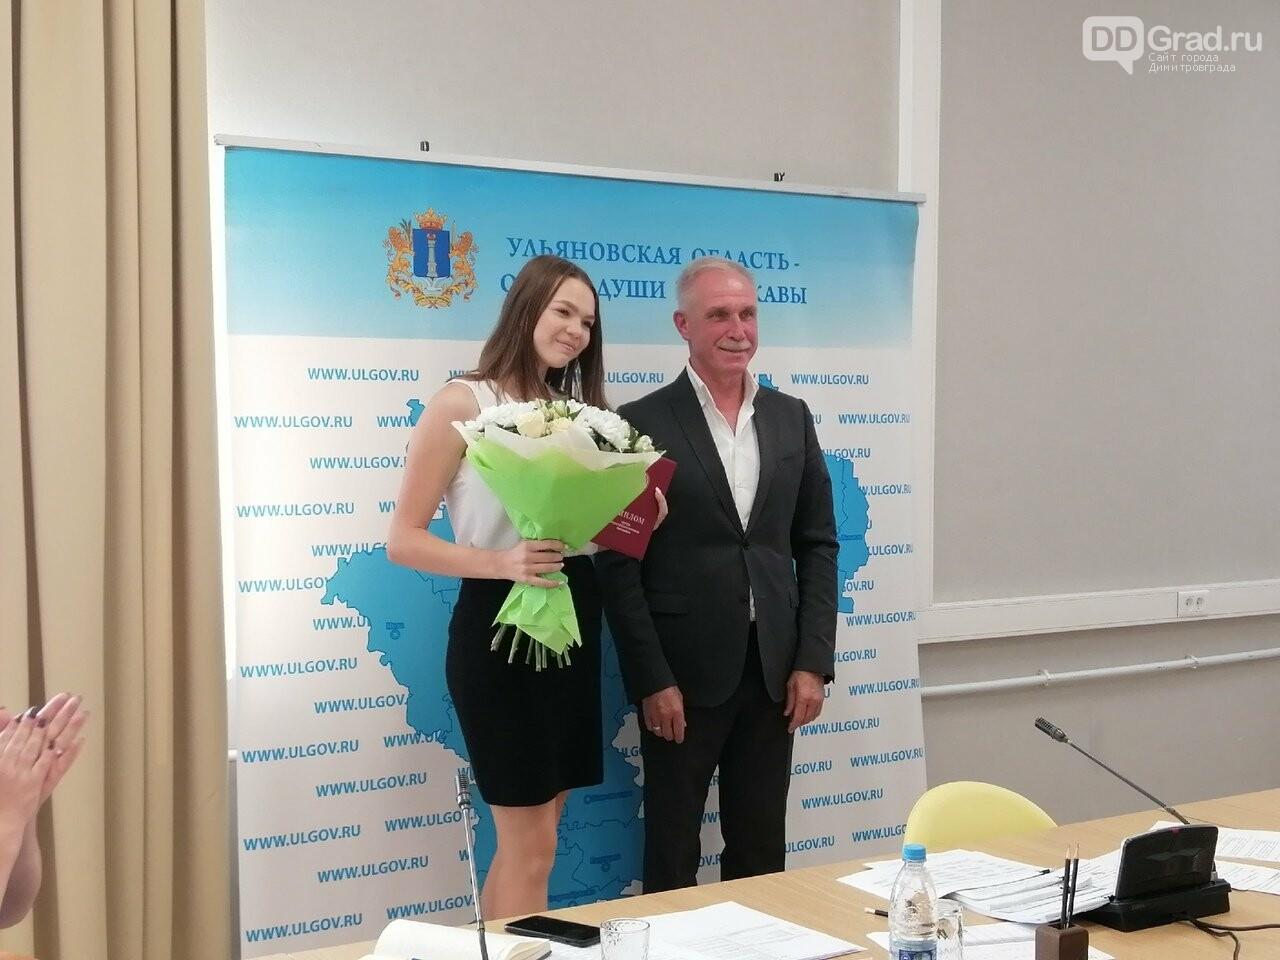 Димитровградских призёров Всероссийских олимпиад школьников наградили медалями , фото-1